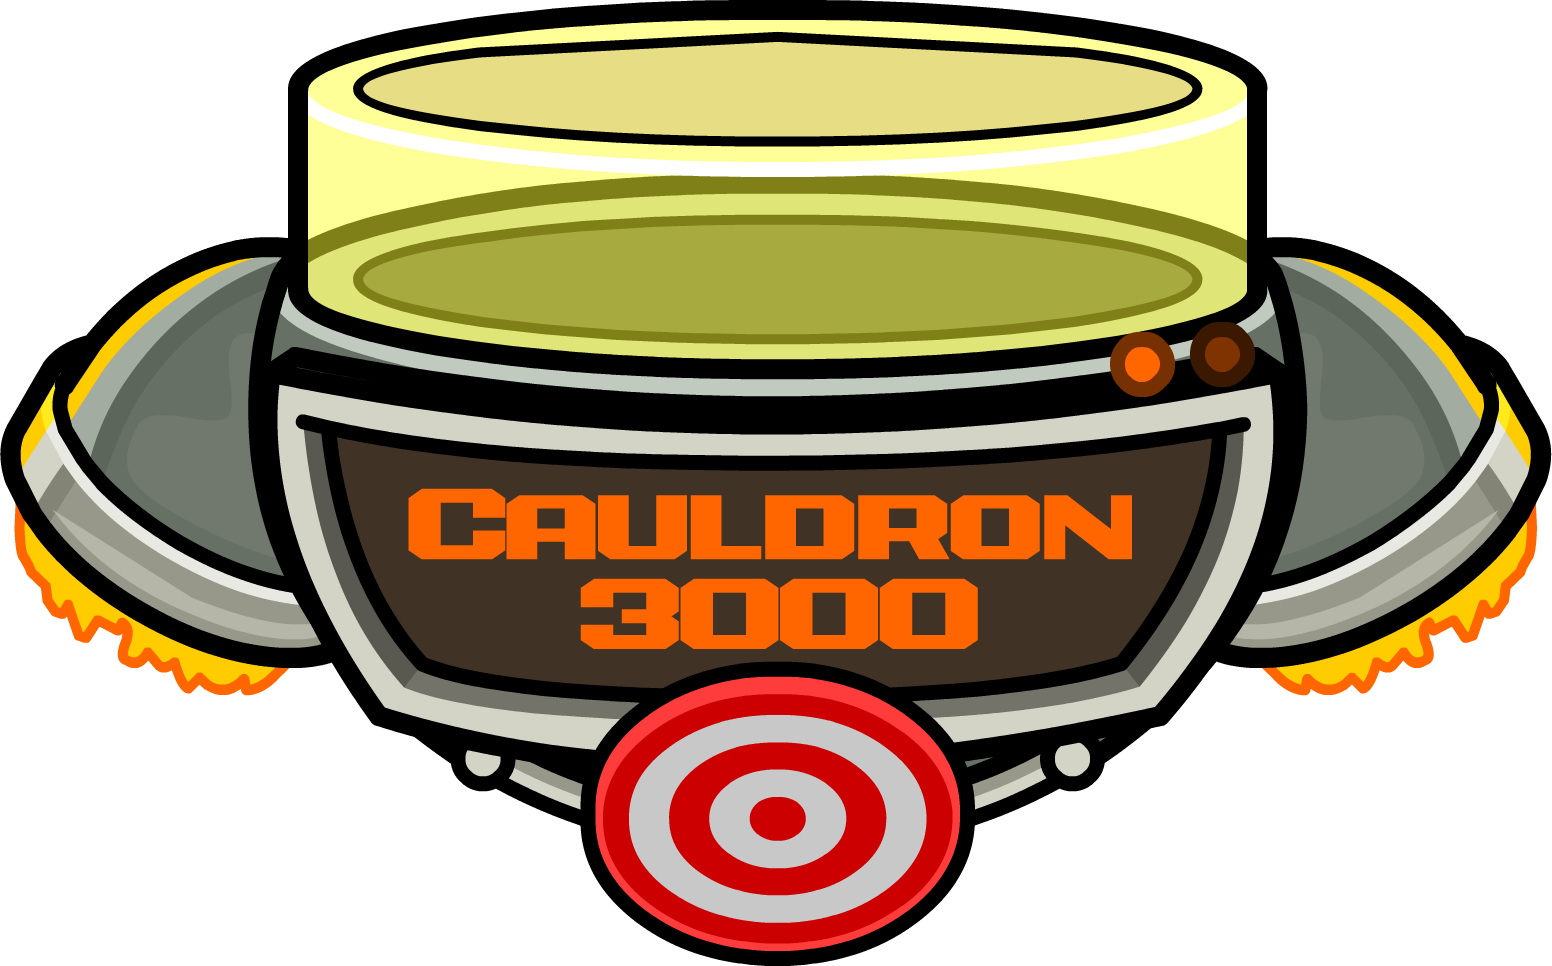 Cauldron 3000